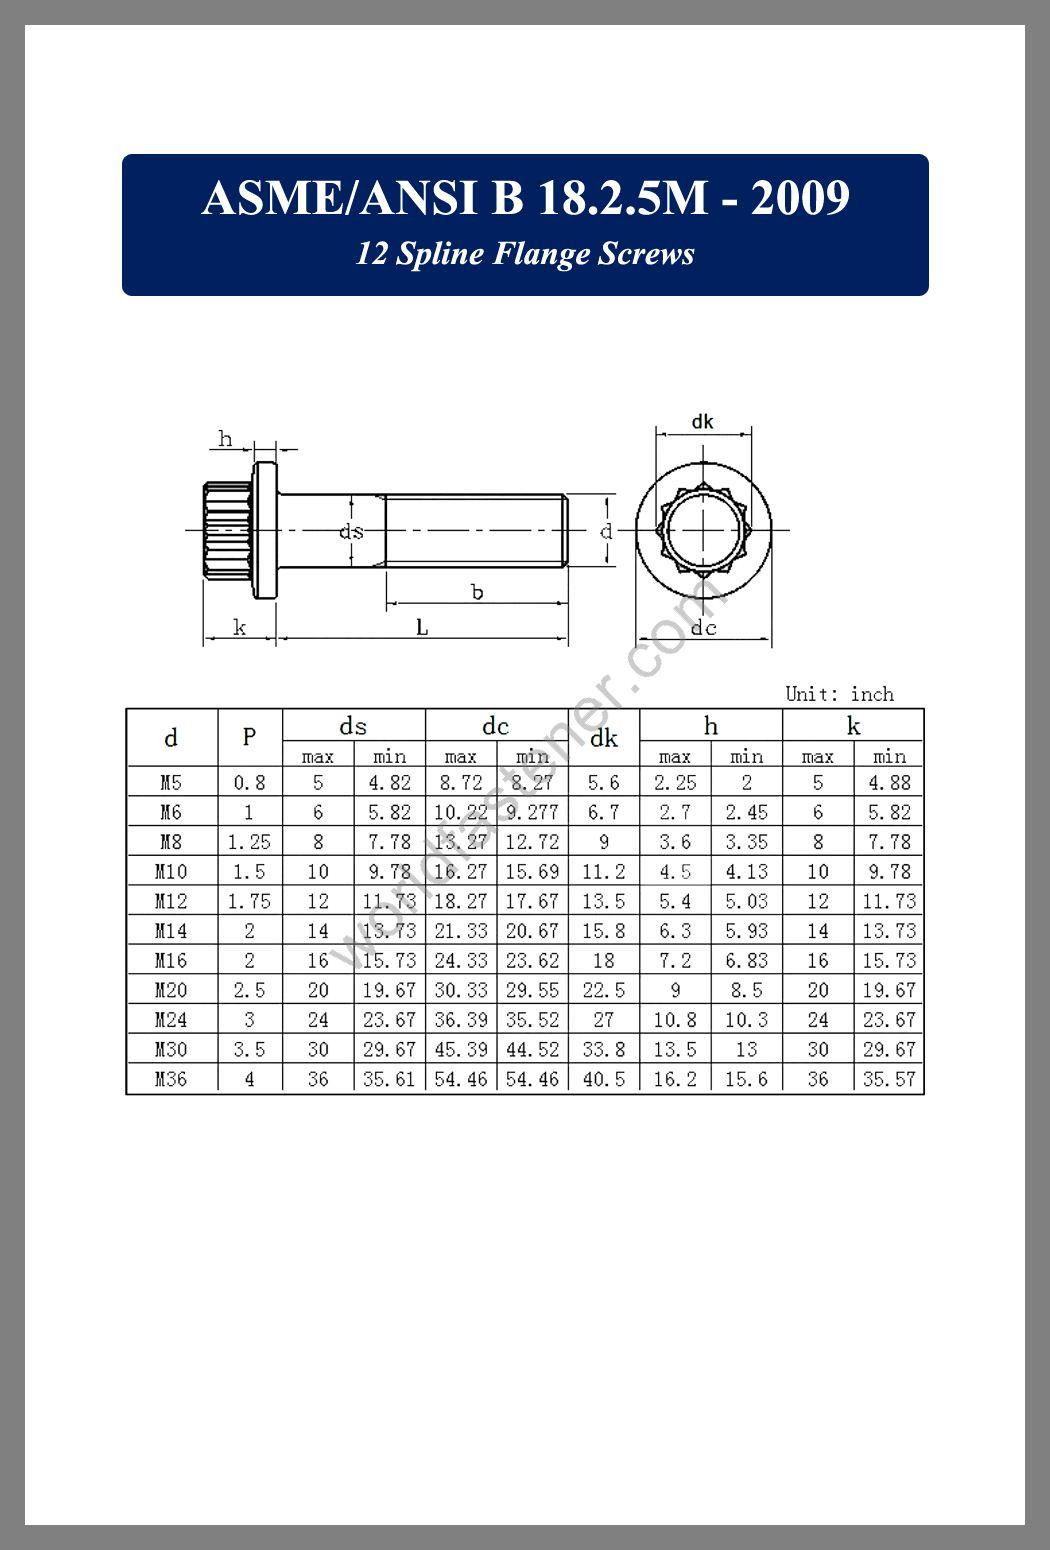 ASME-ANSI B18.2.5M, 12 spline flange screws, fastener, screw, bolt, asme-ansi bolts, asme-ansi screws